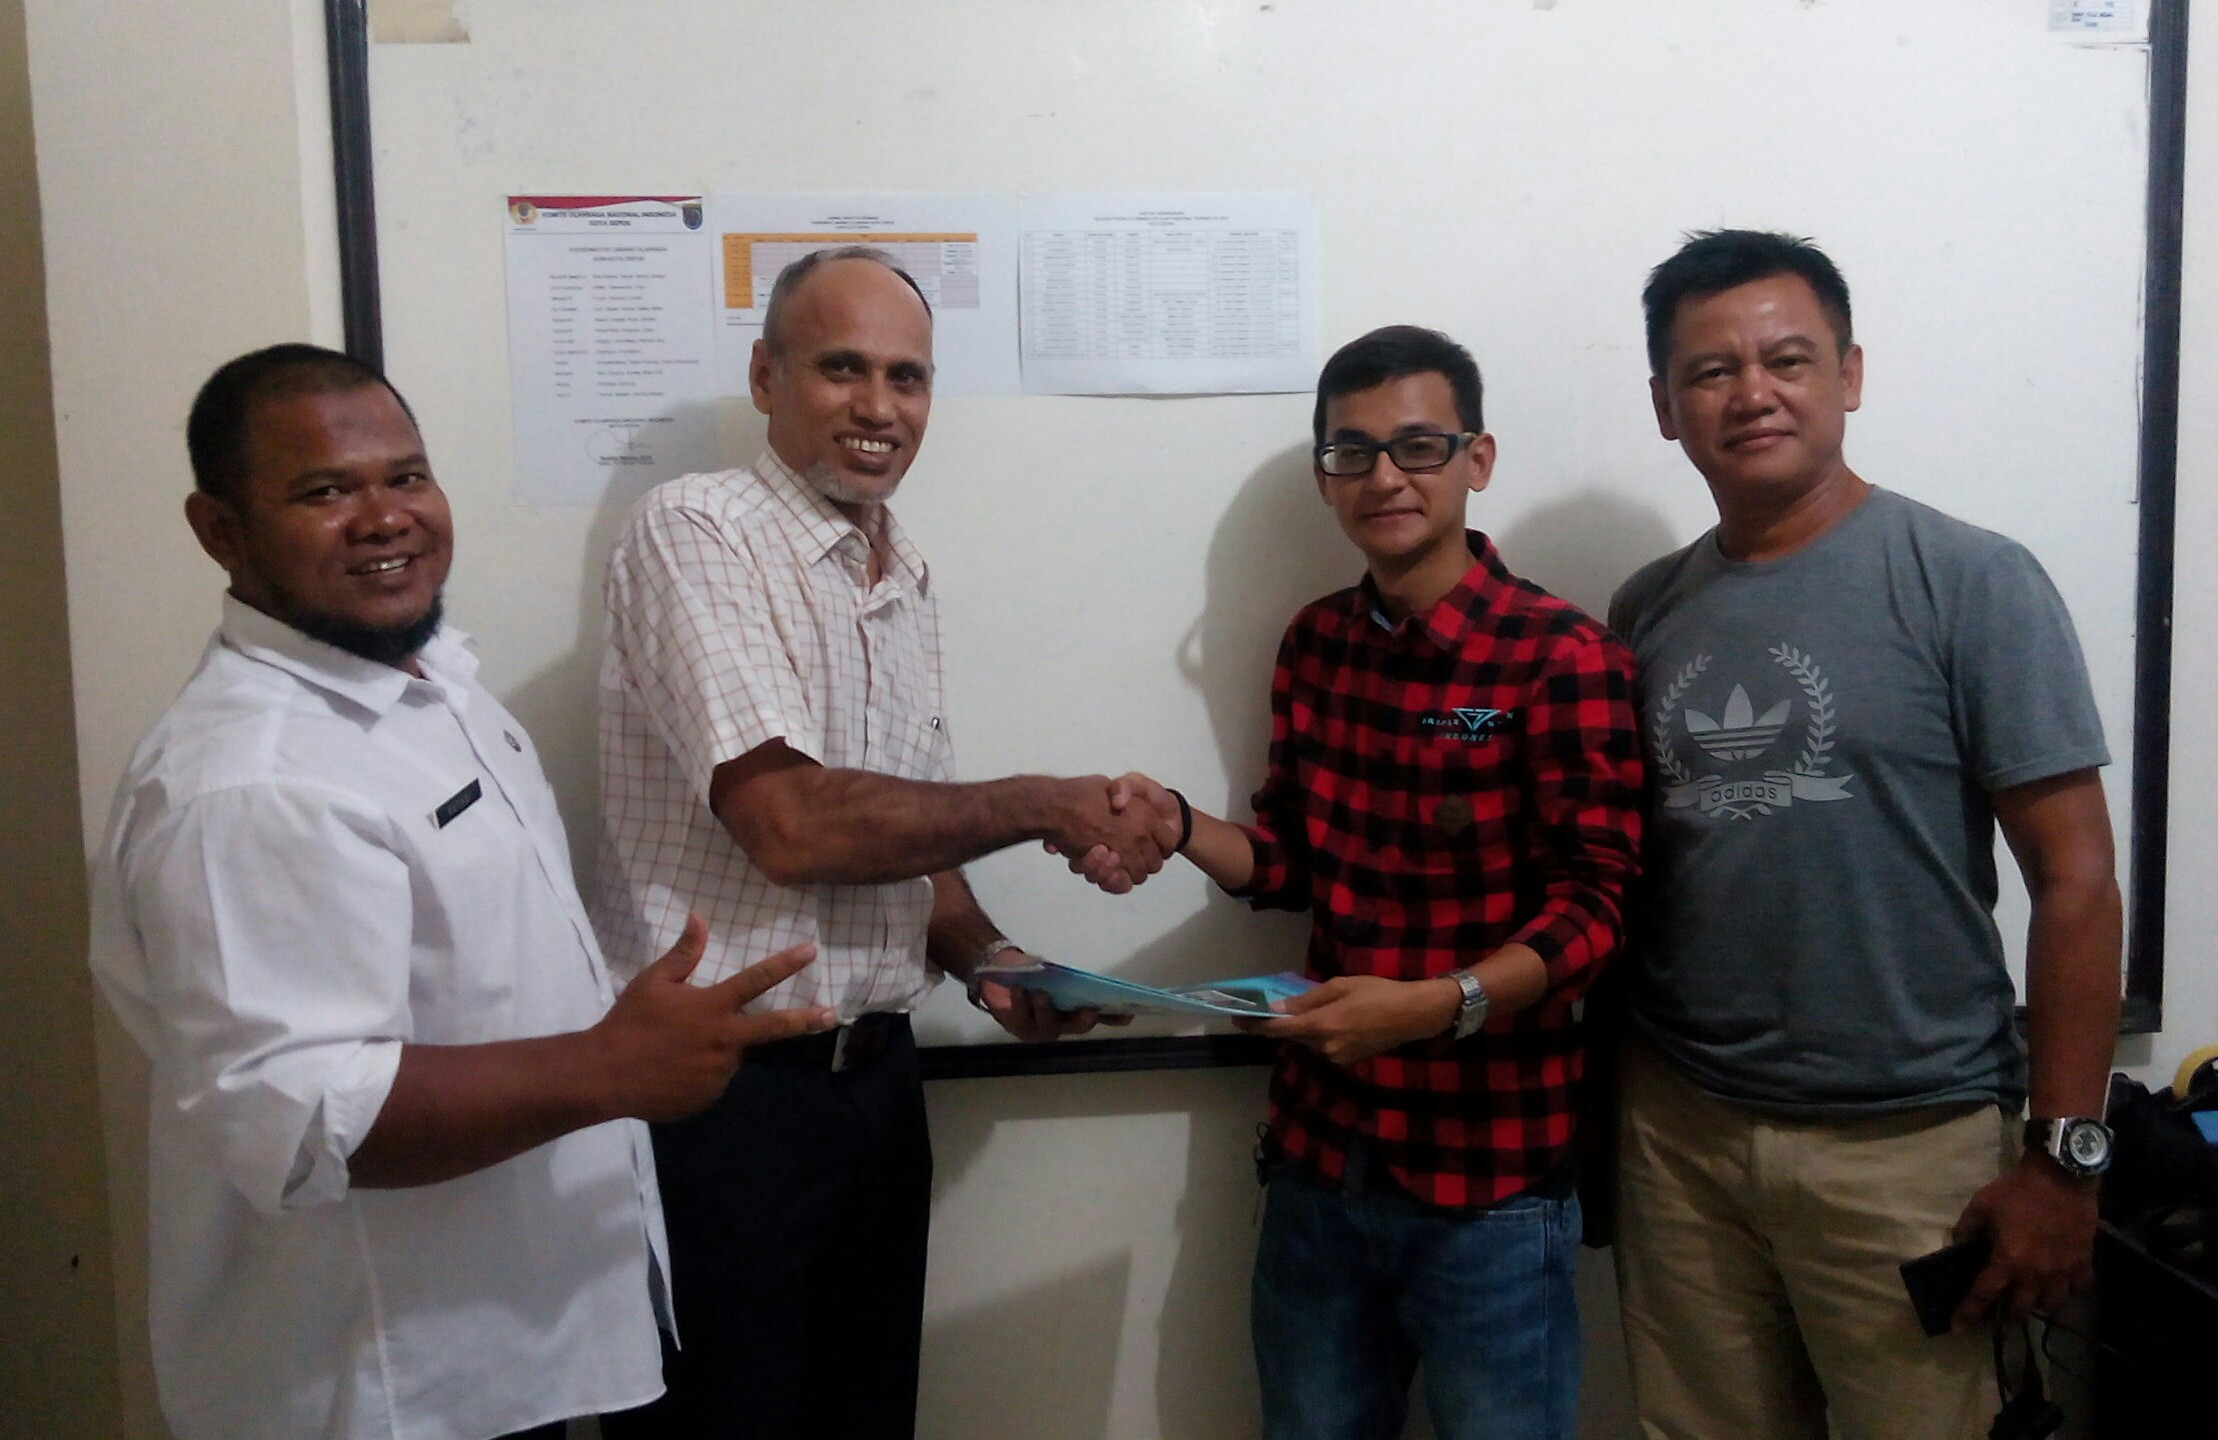 Eki paralayang menyerahkan Technical handbook kepada Mustafa KAbinpres KONI Kota Depok